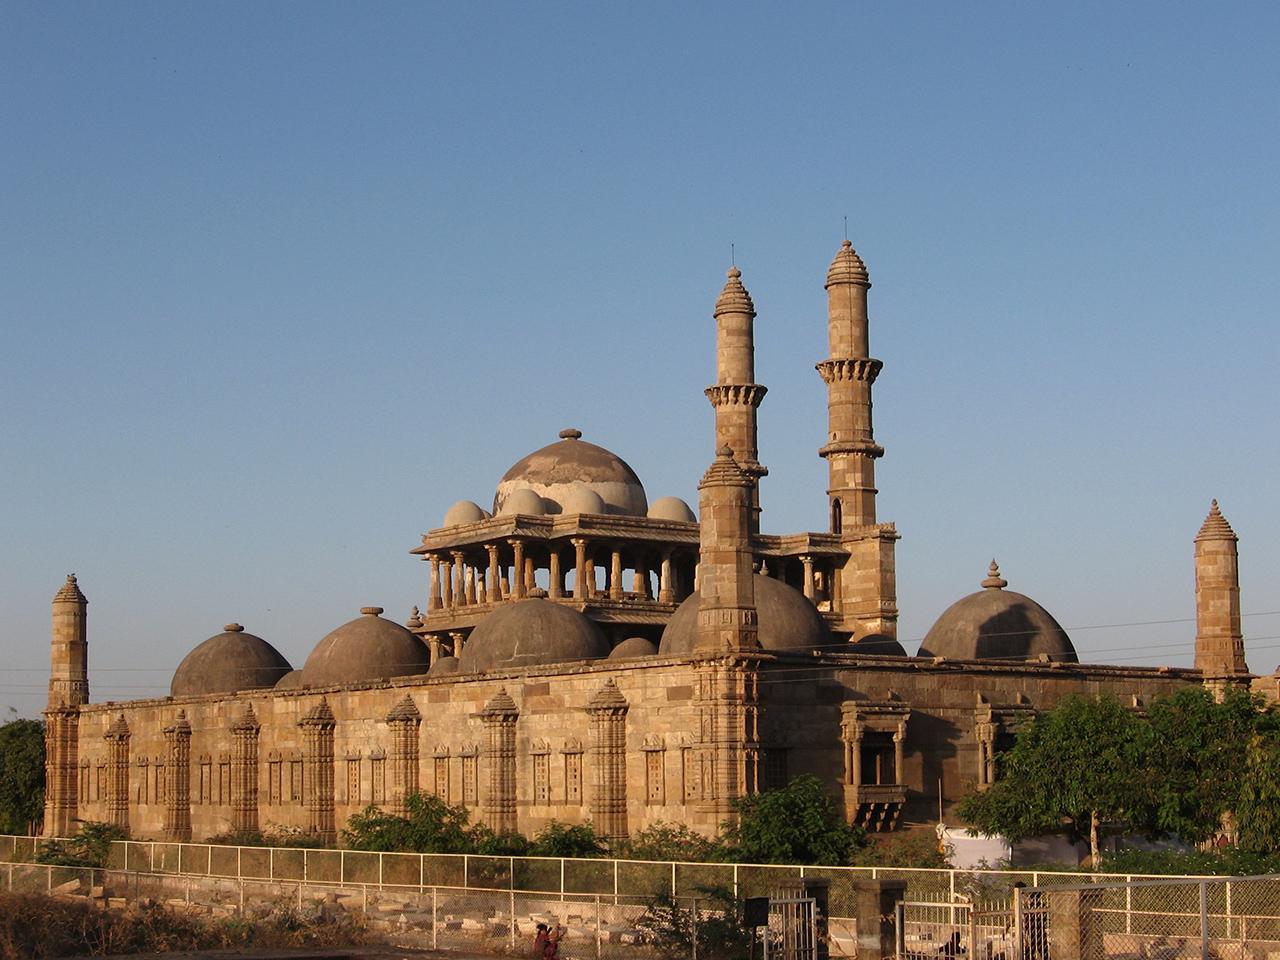 Jama_masjid_in_Champaner